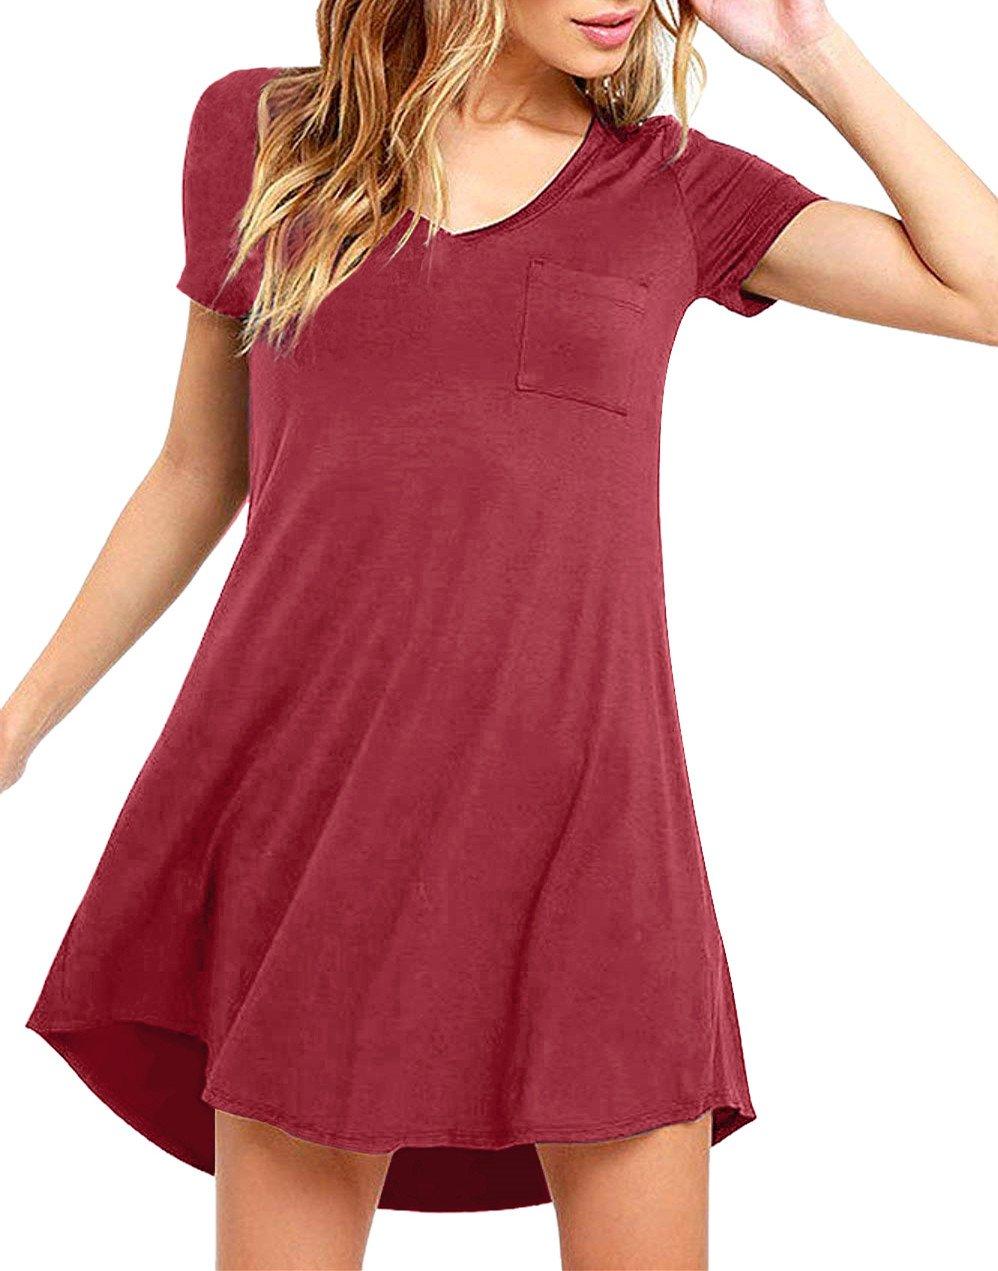 Eanklosco Womens Casual Short Sleeve Plain Pocket V Neck T Shirt Tunic Dress (Wine Red, XL)